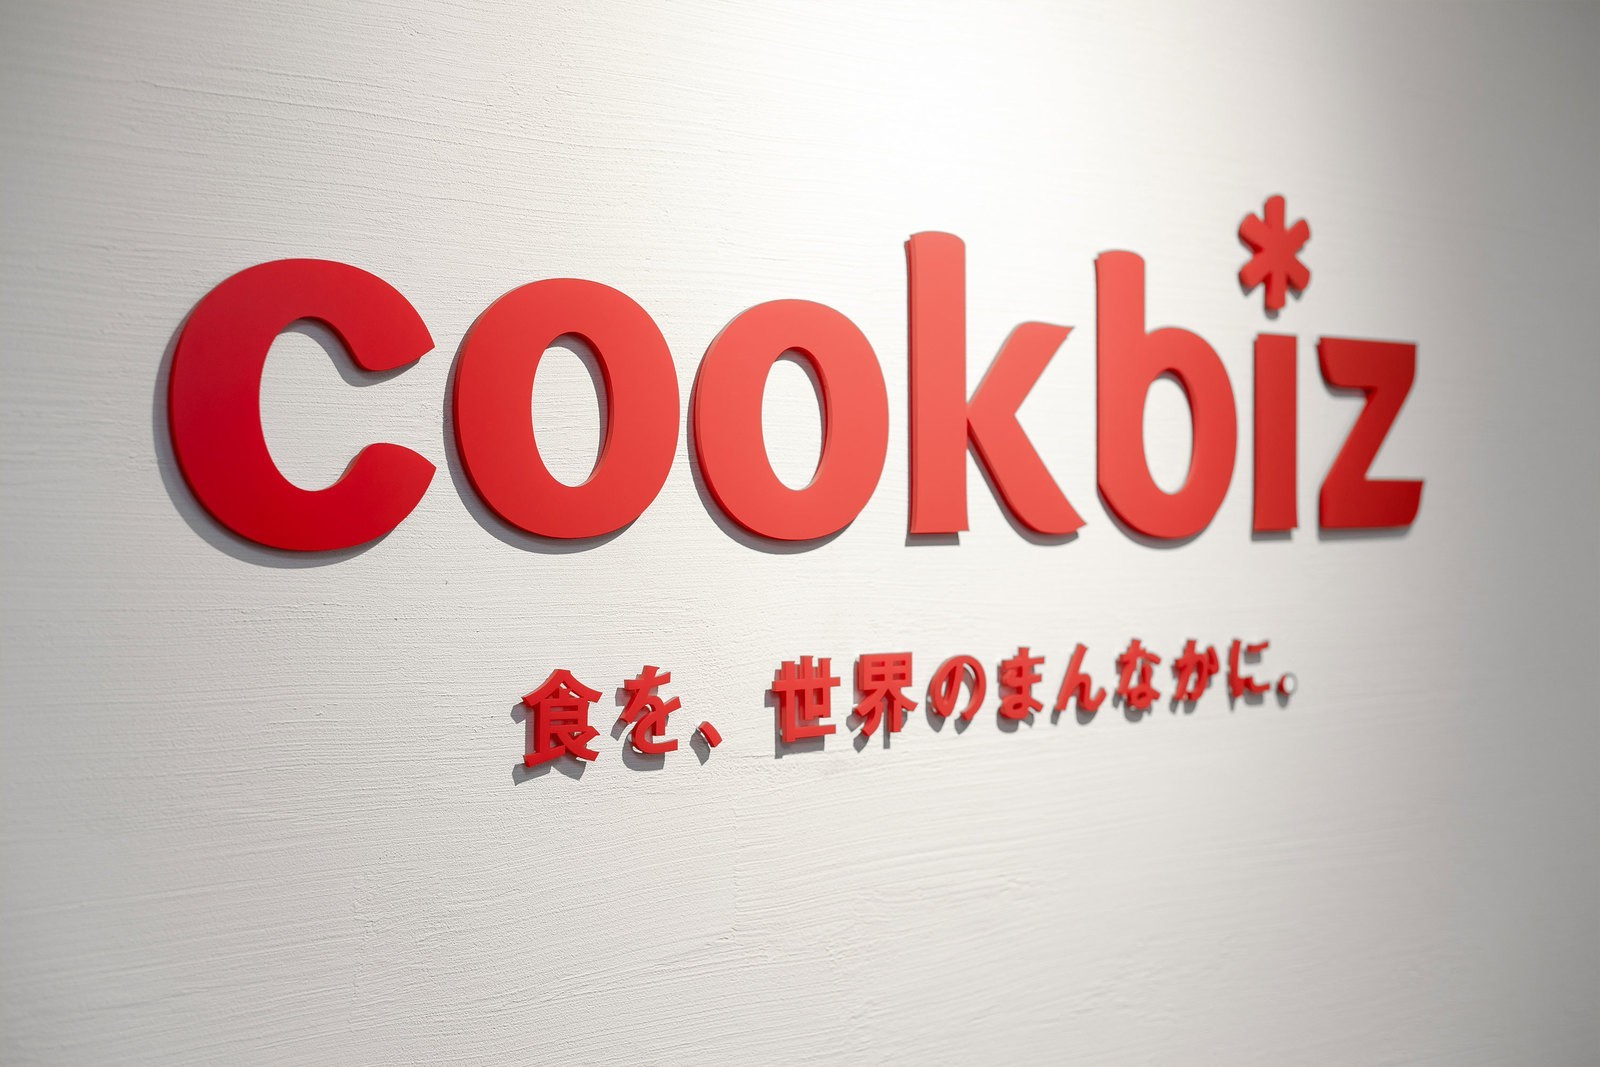 CakePHP3で自社サービスの開発!飲食業界に特化した求人サイト「cookbiz」を開発するPHPエンジニアを大阪で募集!